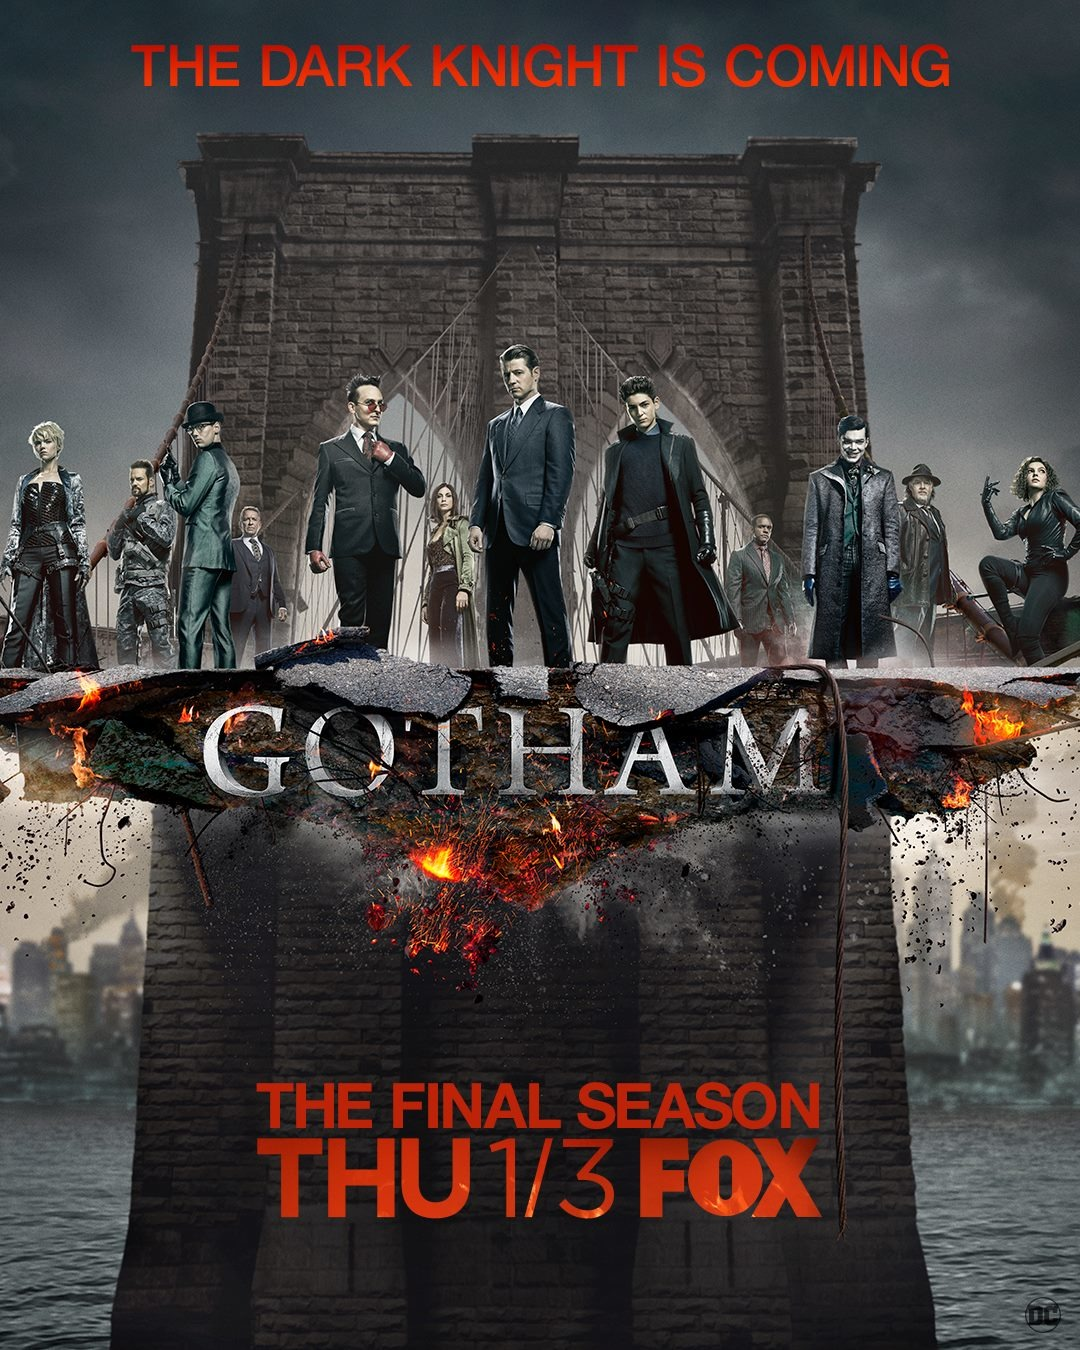 Calendrier Gotham.Gotham 2014 Saison 5 Allocine